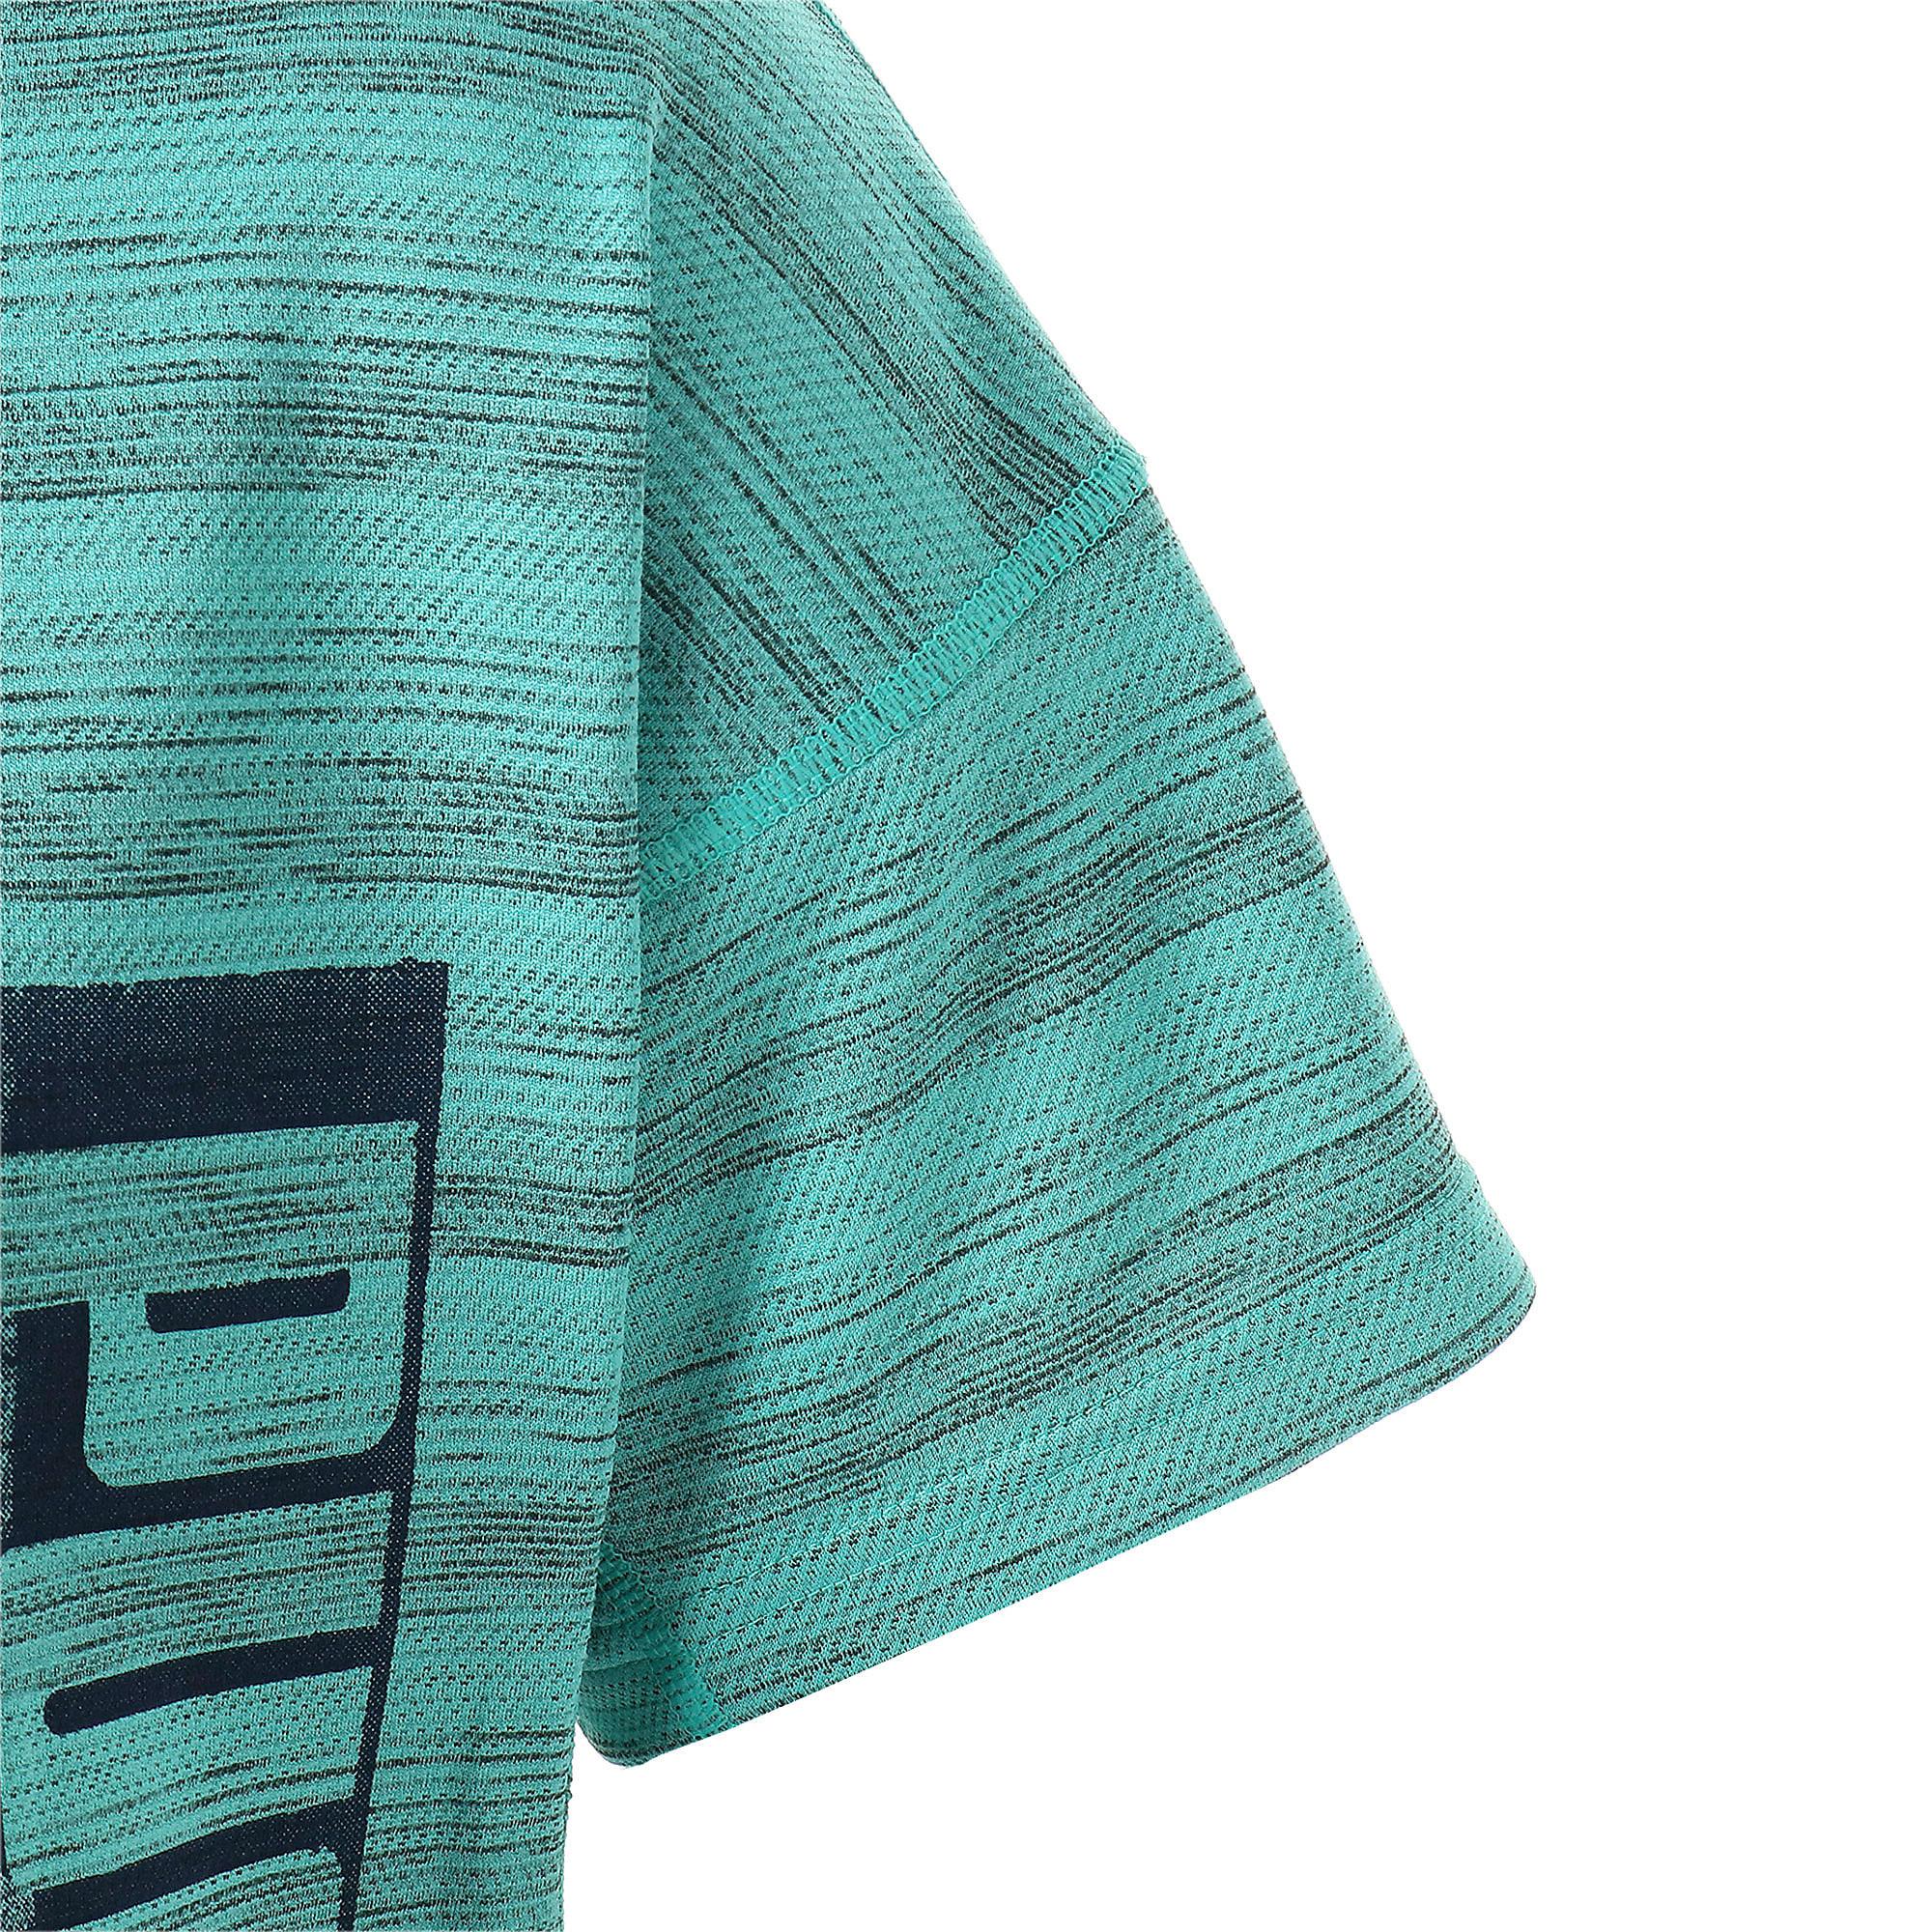 Thumbnail 8 of LAST LAP ヘザー SS ランニング Tシャツ 半袖, Blue Turquoise Heather, medium-JPN